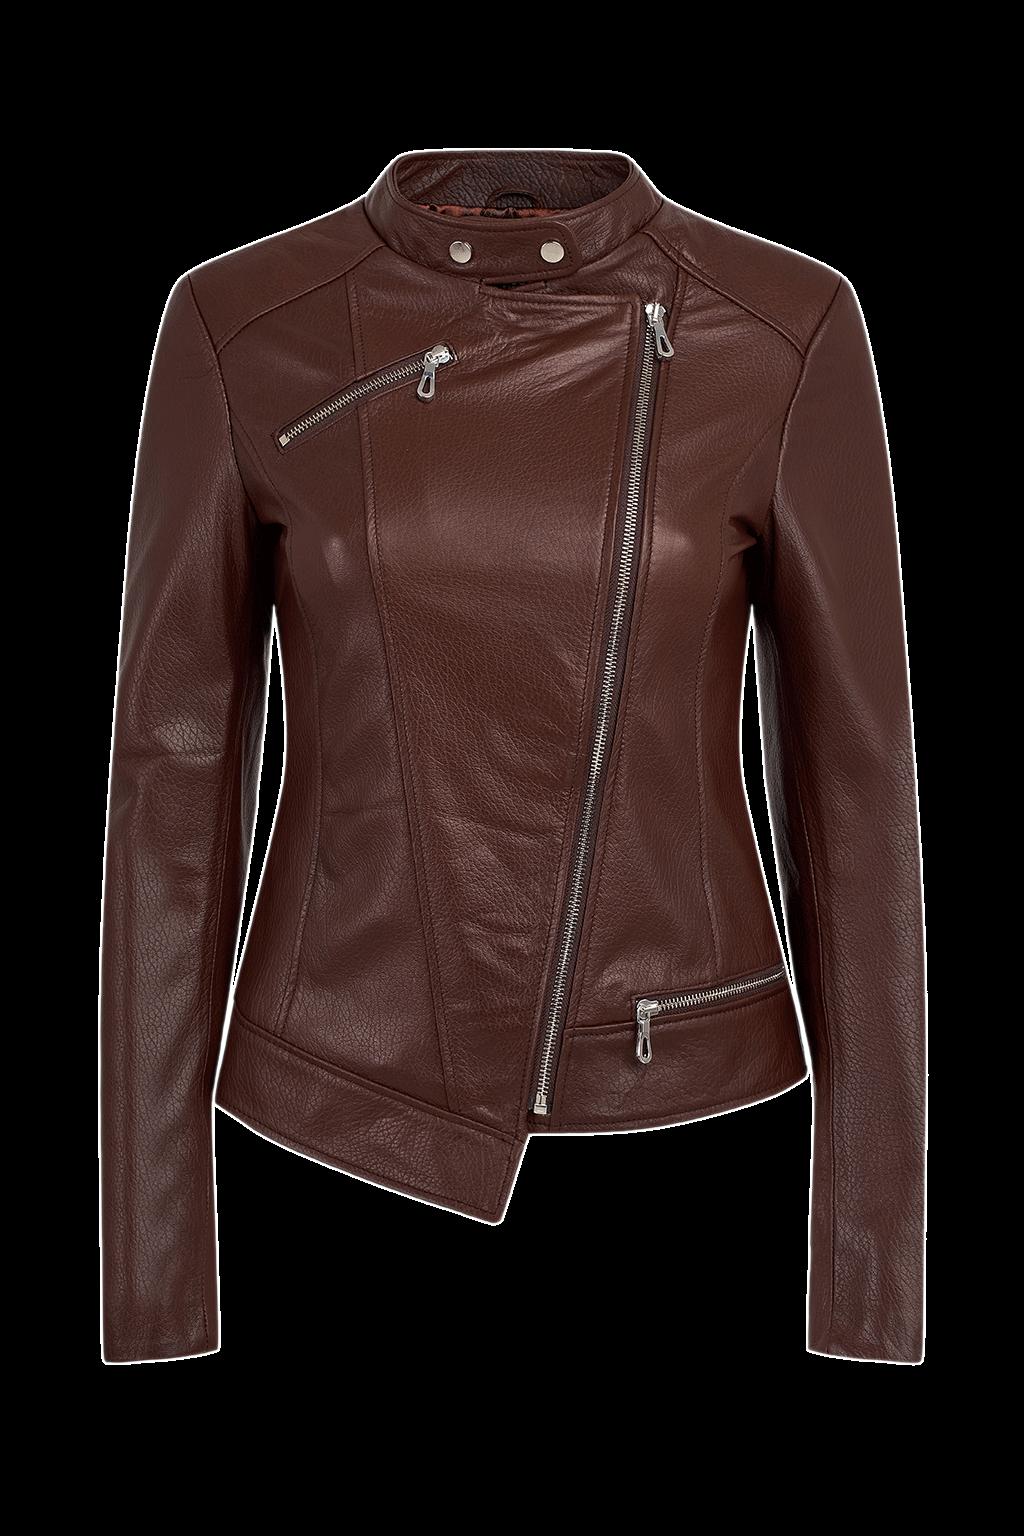 Women's Asymmetric Leather Jacket - Brown